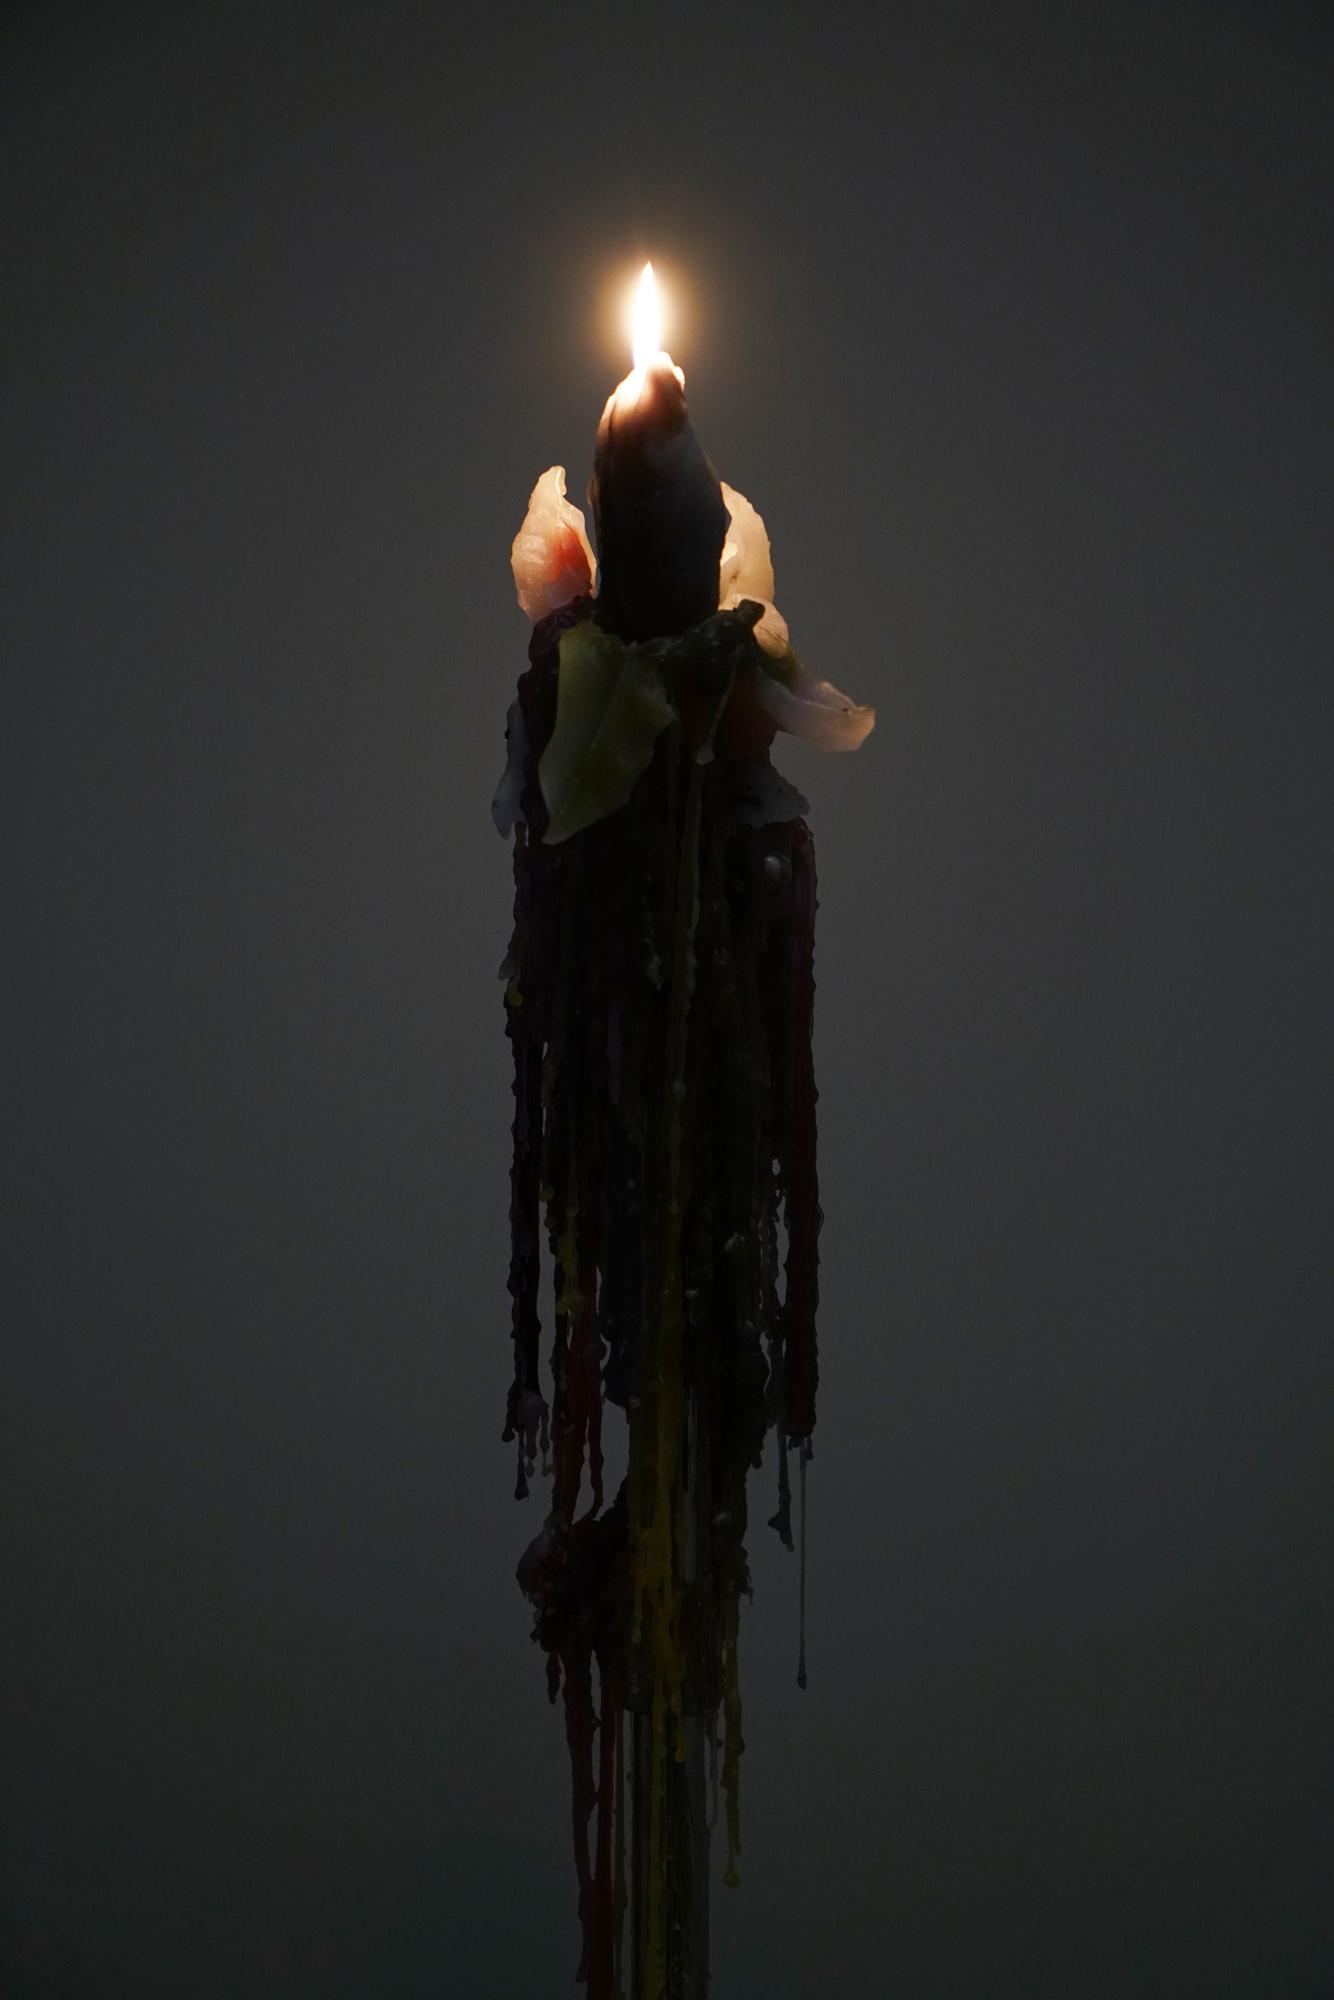 Hings Lim Flaming Tower